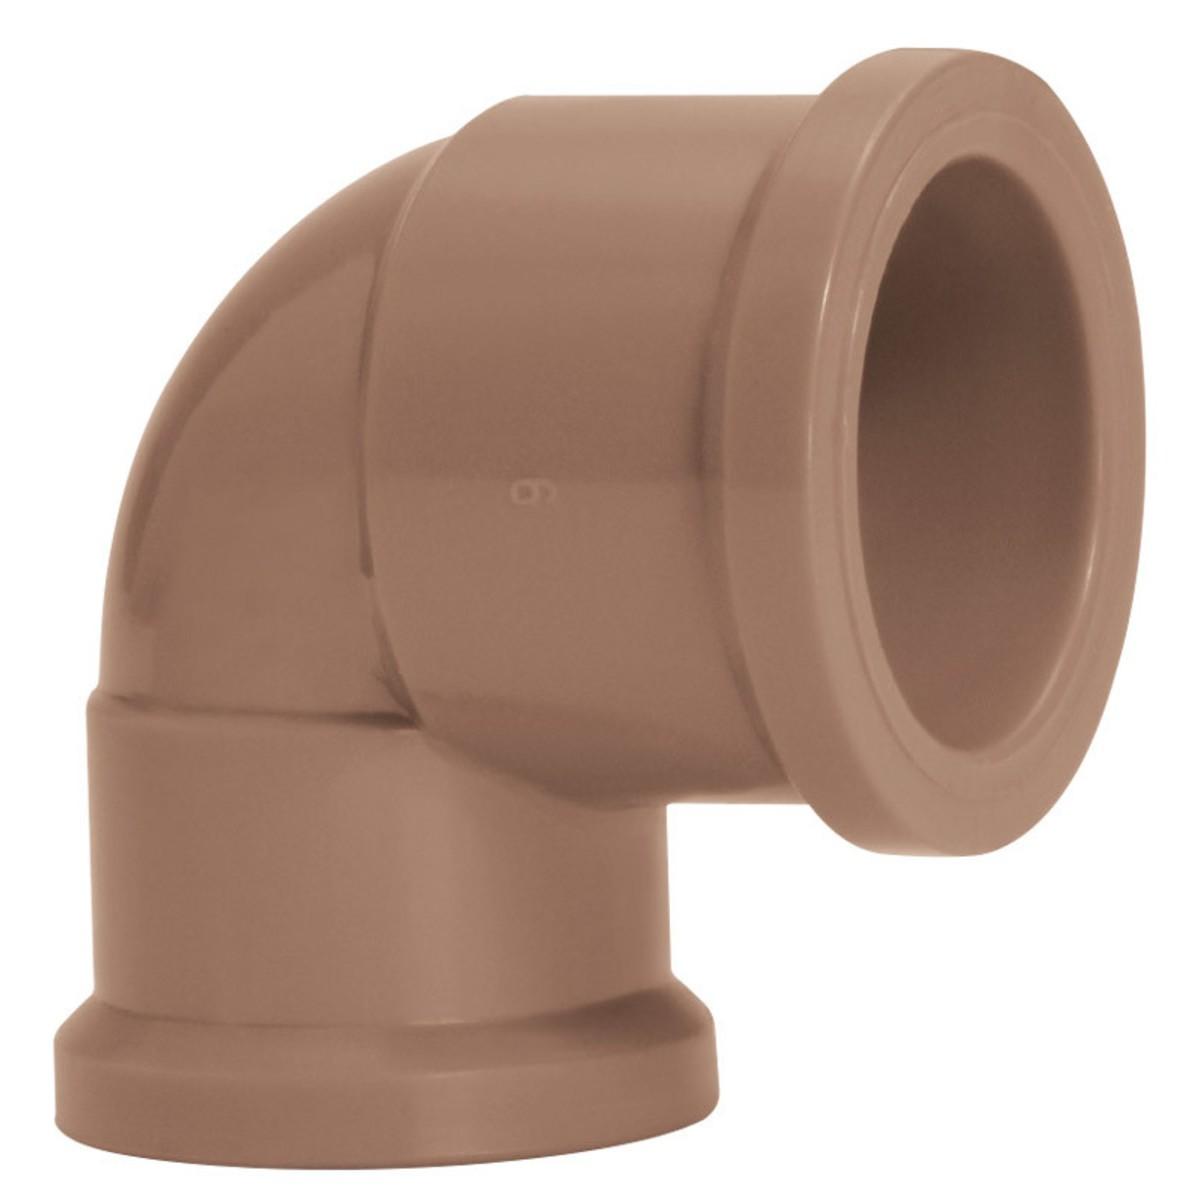 Joelho de Reducao 90 Soldavel PVC Marrom 32 mm x 25 mm - Amanco